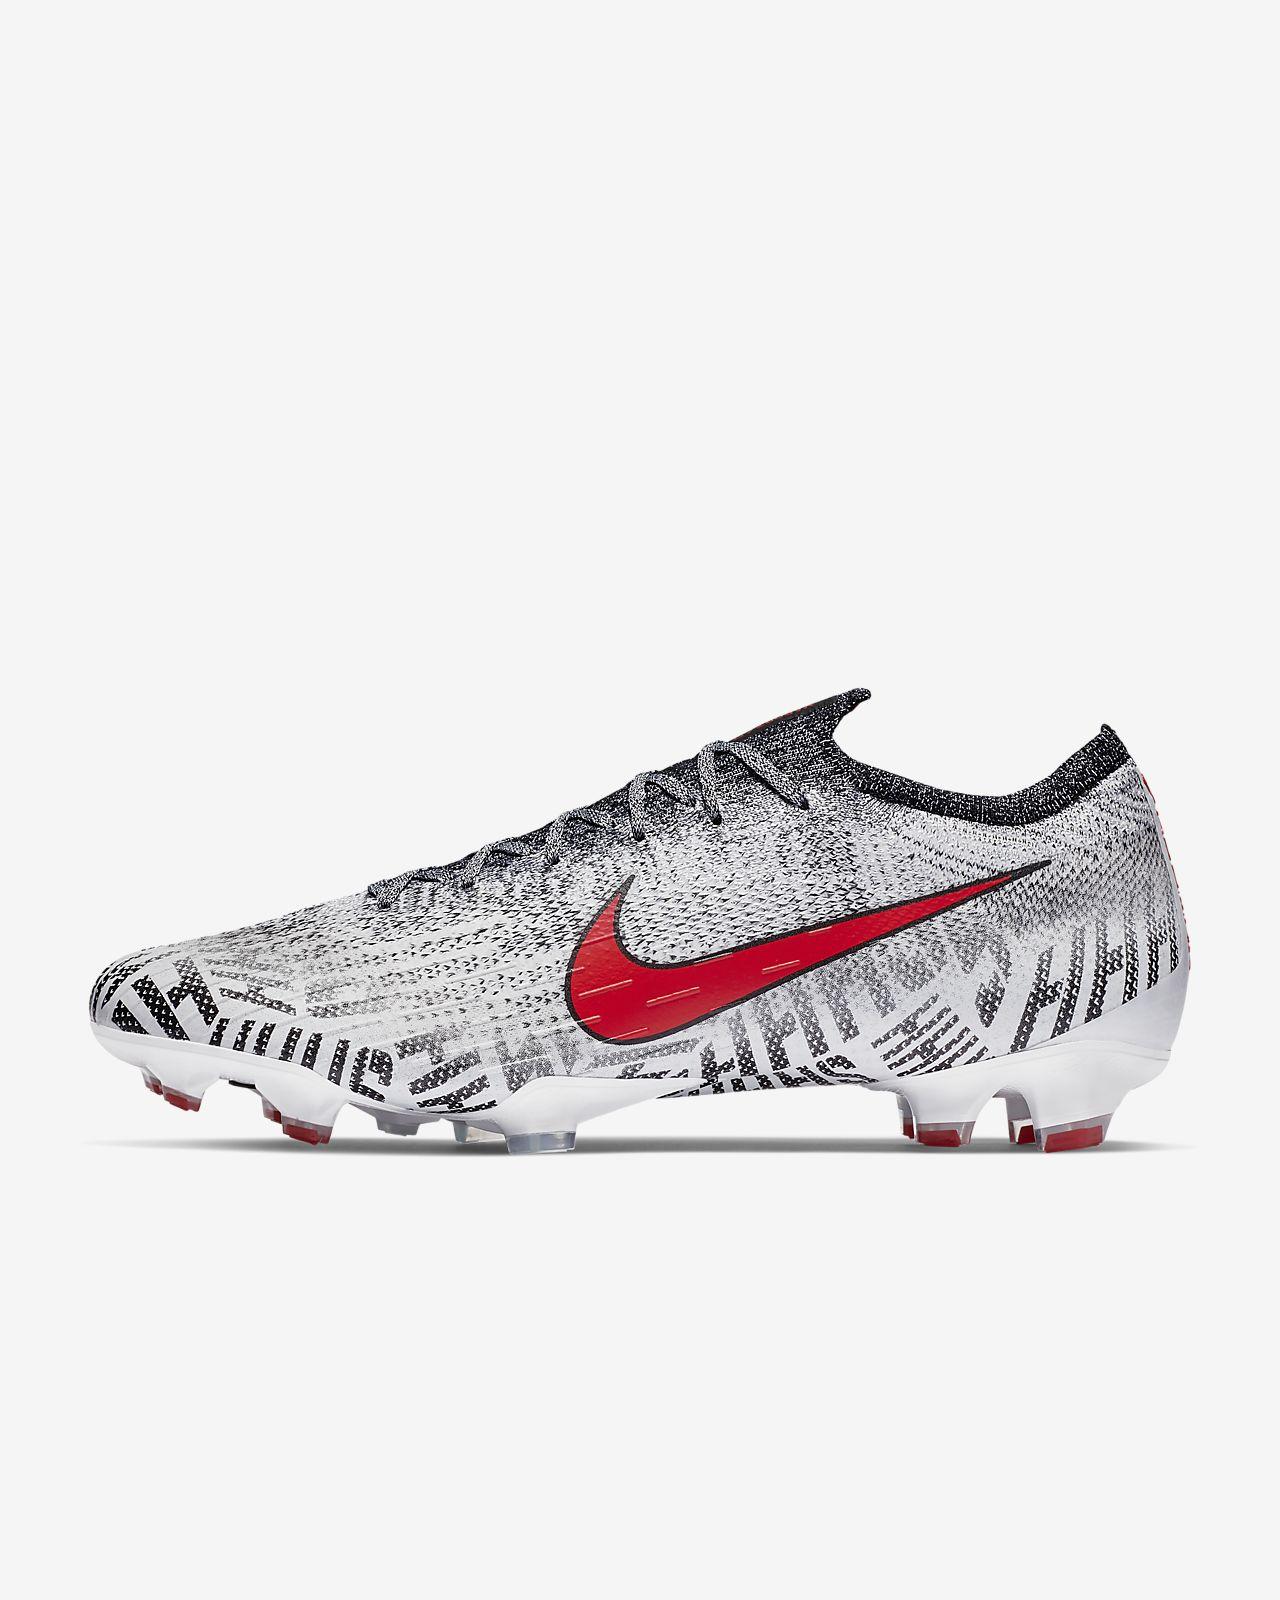 46f0bb663e Chaussure de football à crampons pour terrain sec Nike Mercurial .